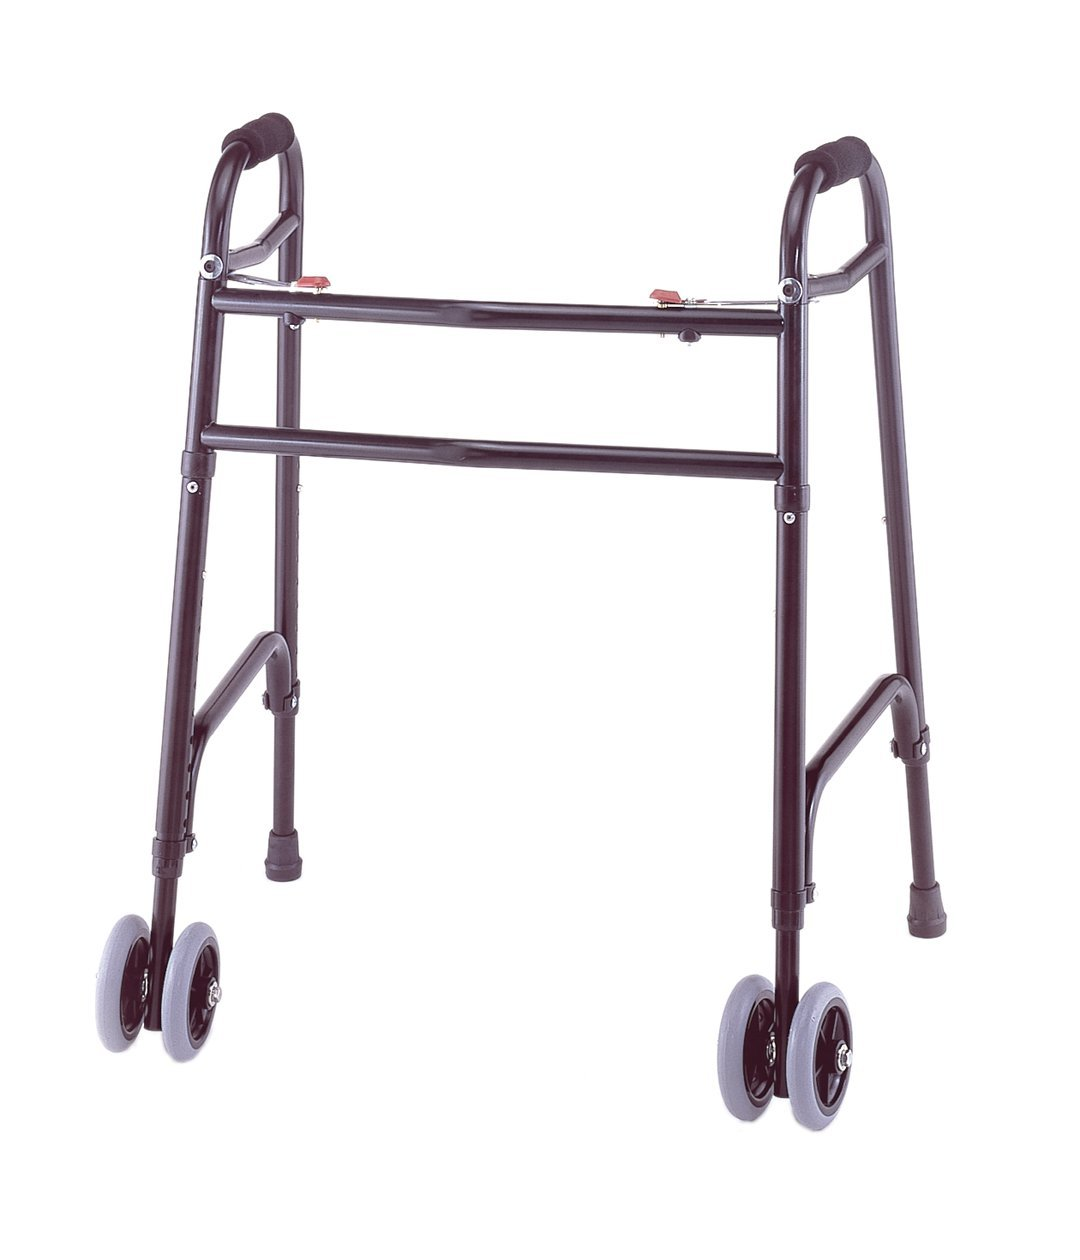 ConvaQuip 833F Bariatric Folding Walker Wheel Kit